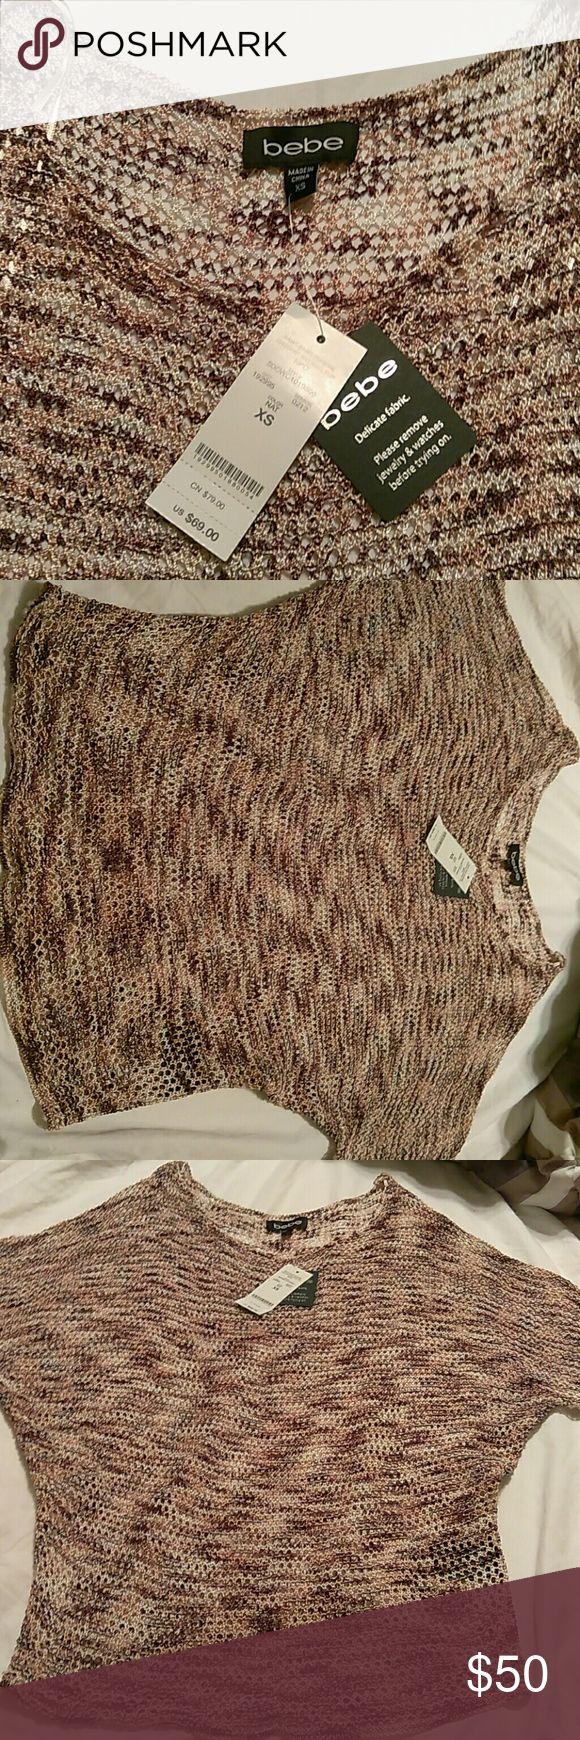 bebe Crochet Batwing Top NWT bebe Tops Blouses